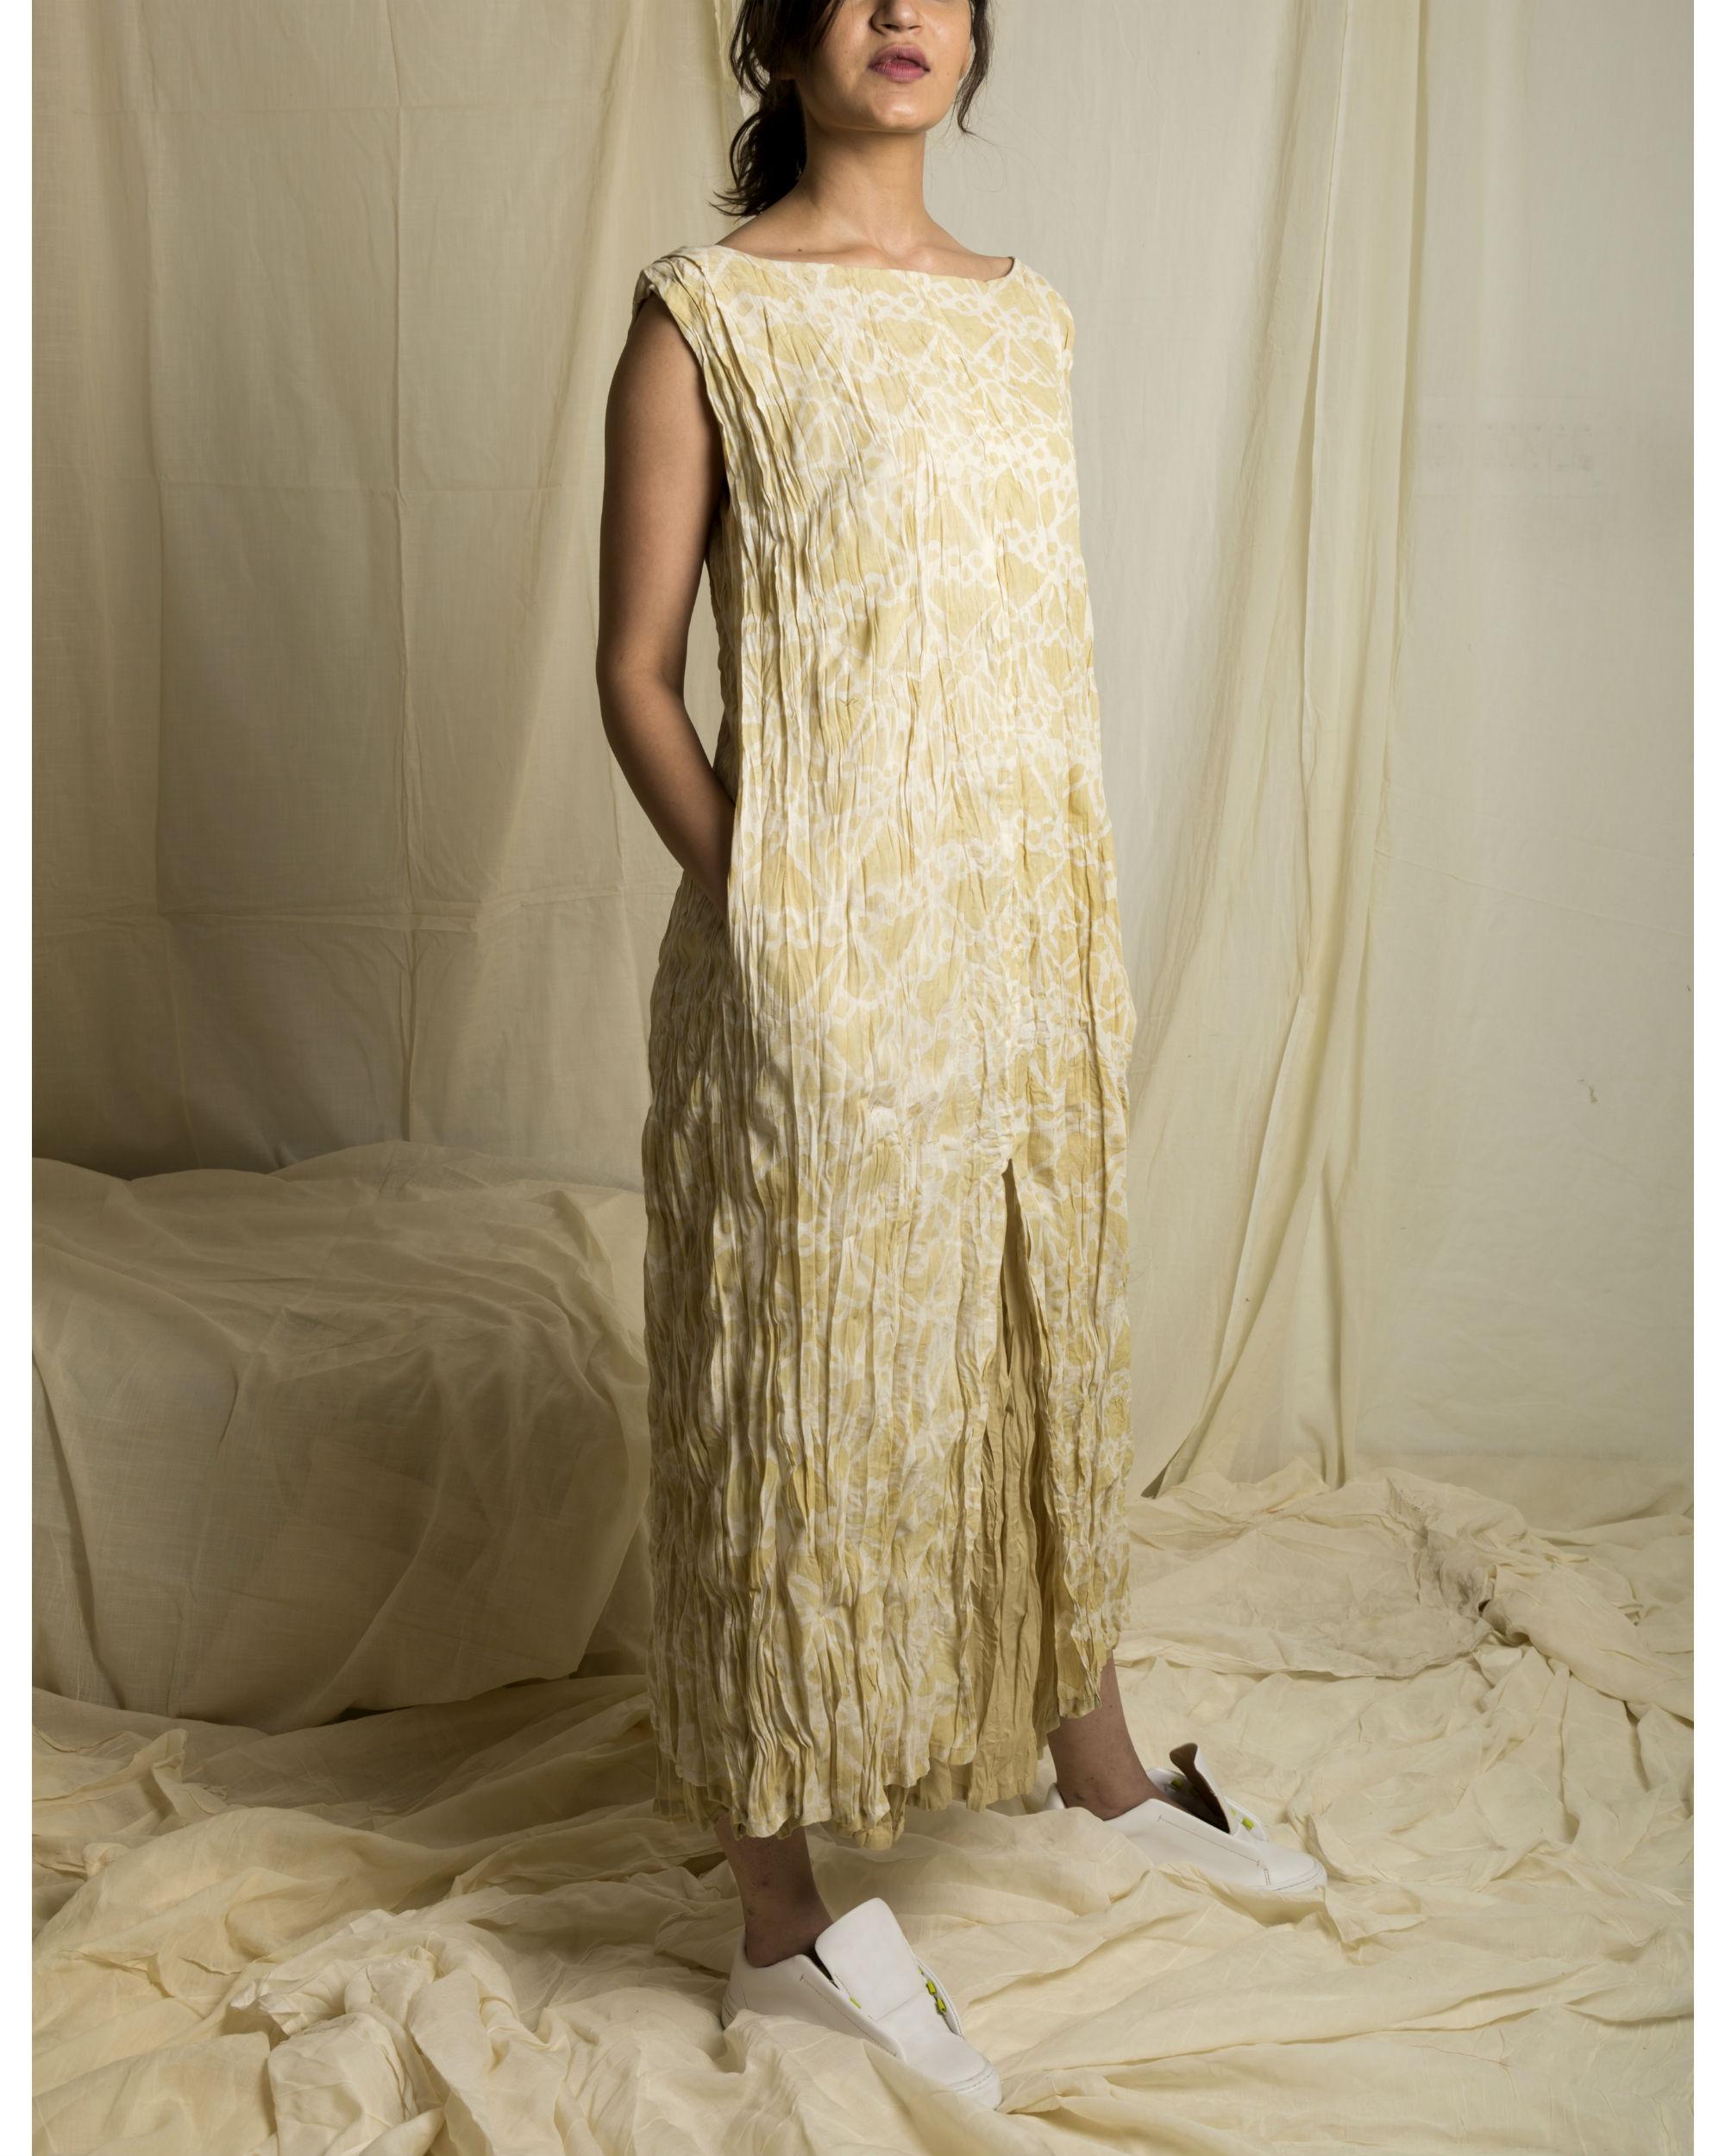 Dessert snug dress